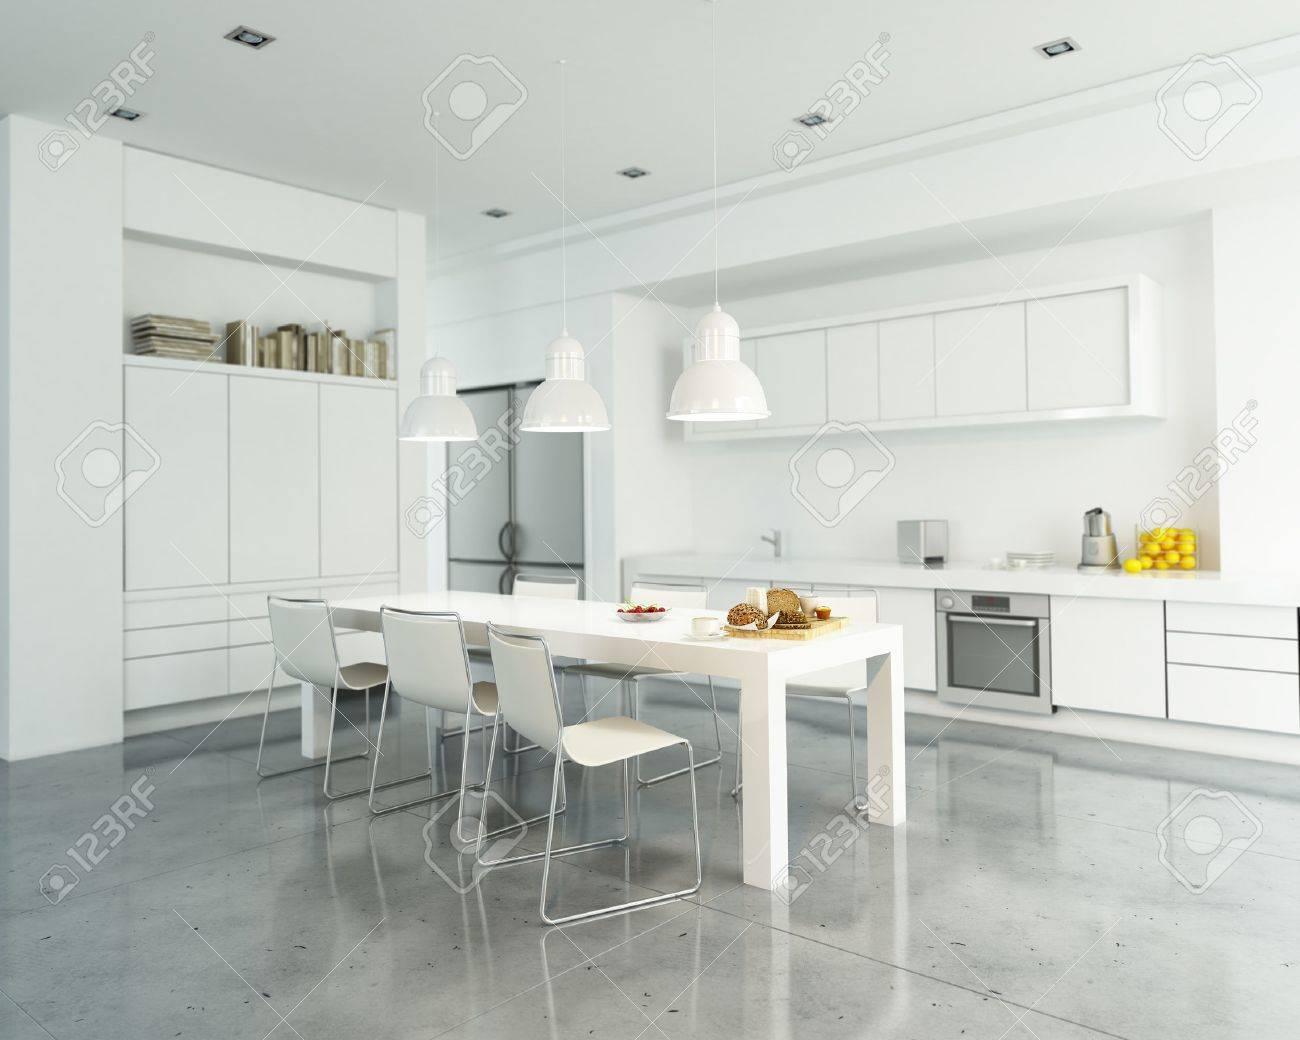 Representacion 3d De Una Cocina Blanca Moderna Y Espaciosa Fotos - Cocina-blanca-moderna